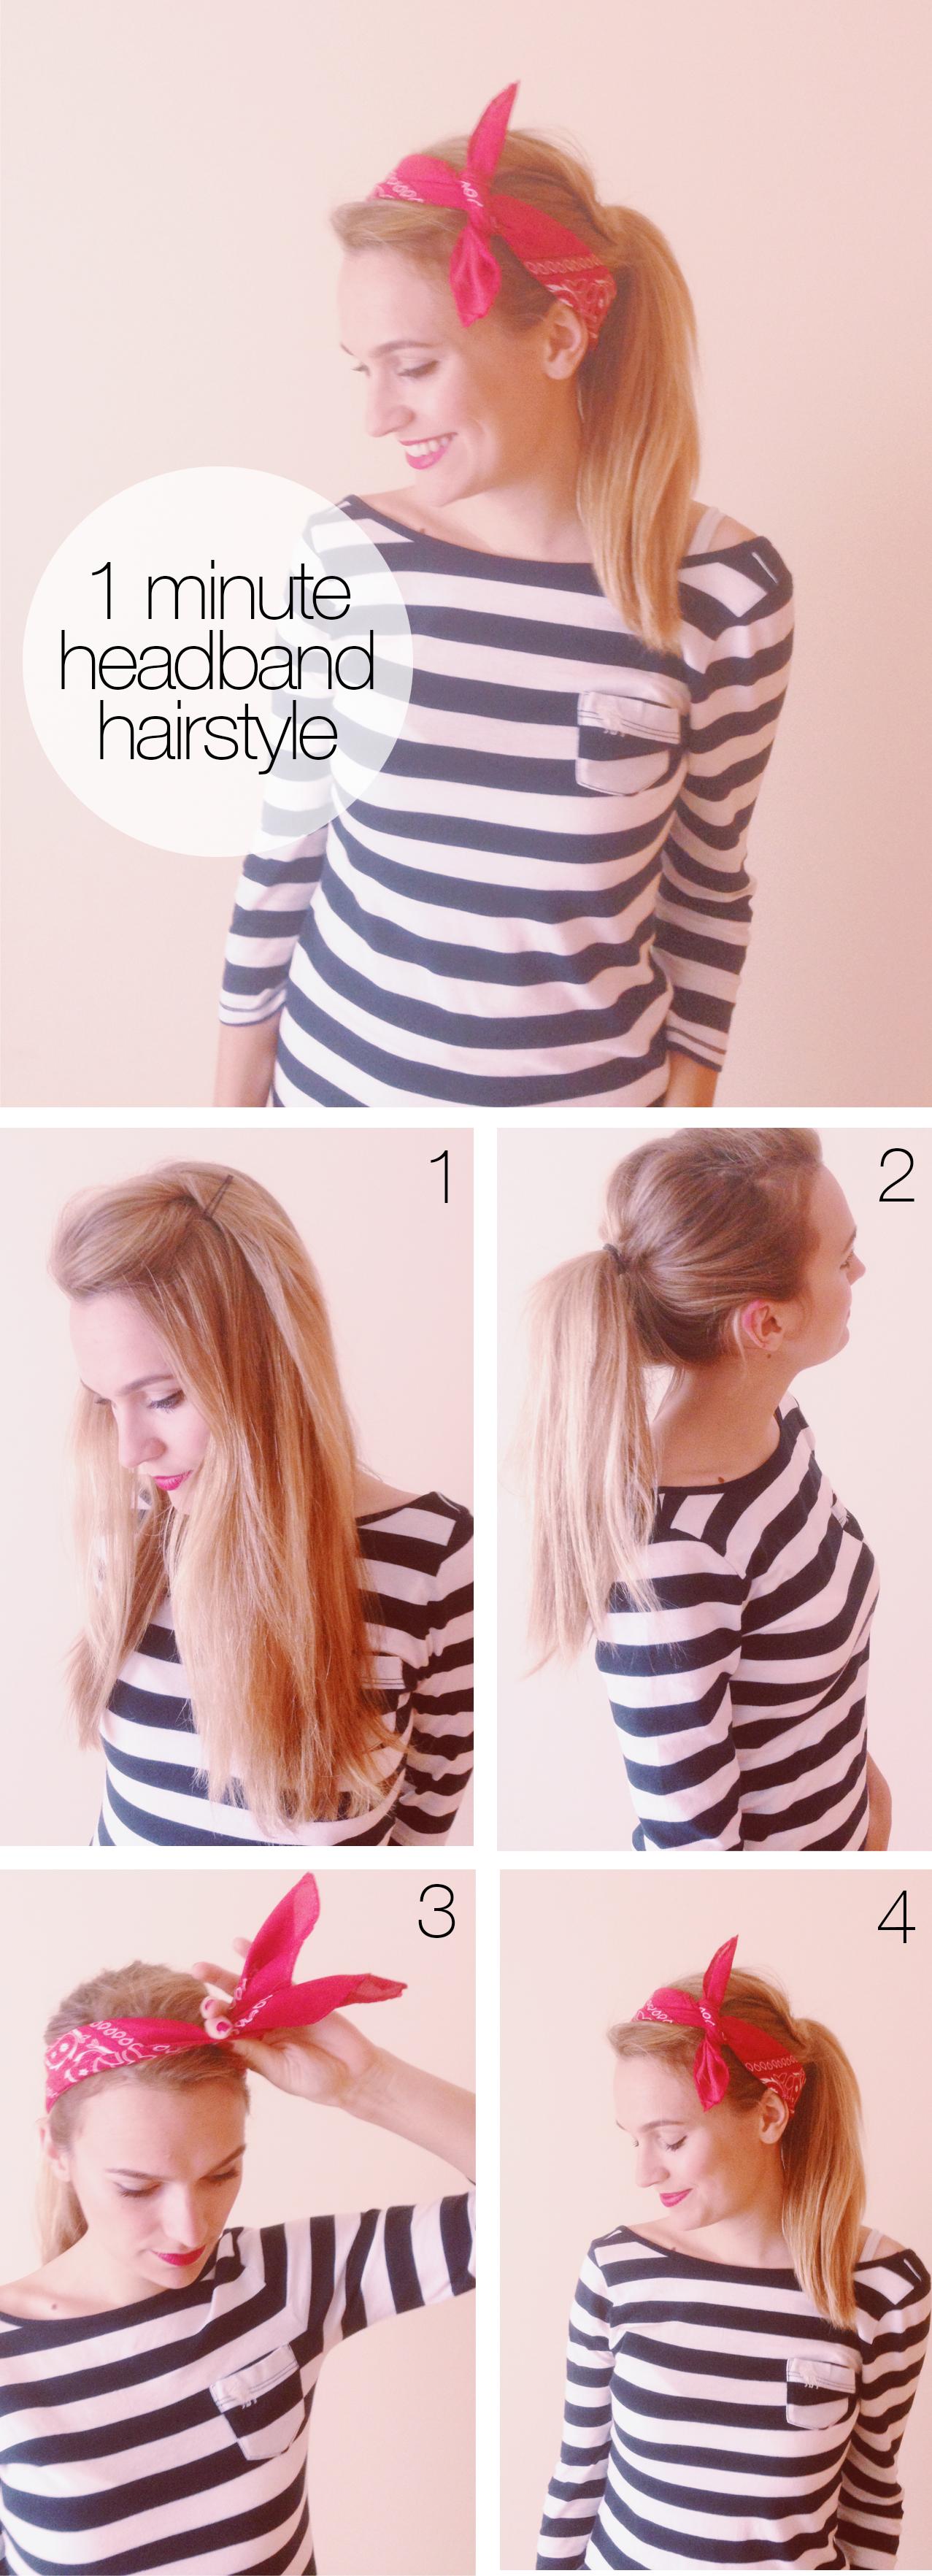 DIY Summer Headband Hairstyle Bandana | Bandana hairstyles, Ponytail hairstyles, Scarf hairstyles